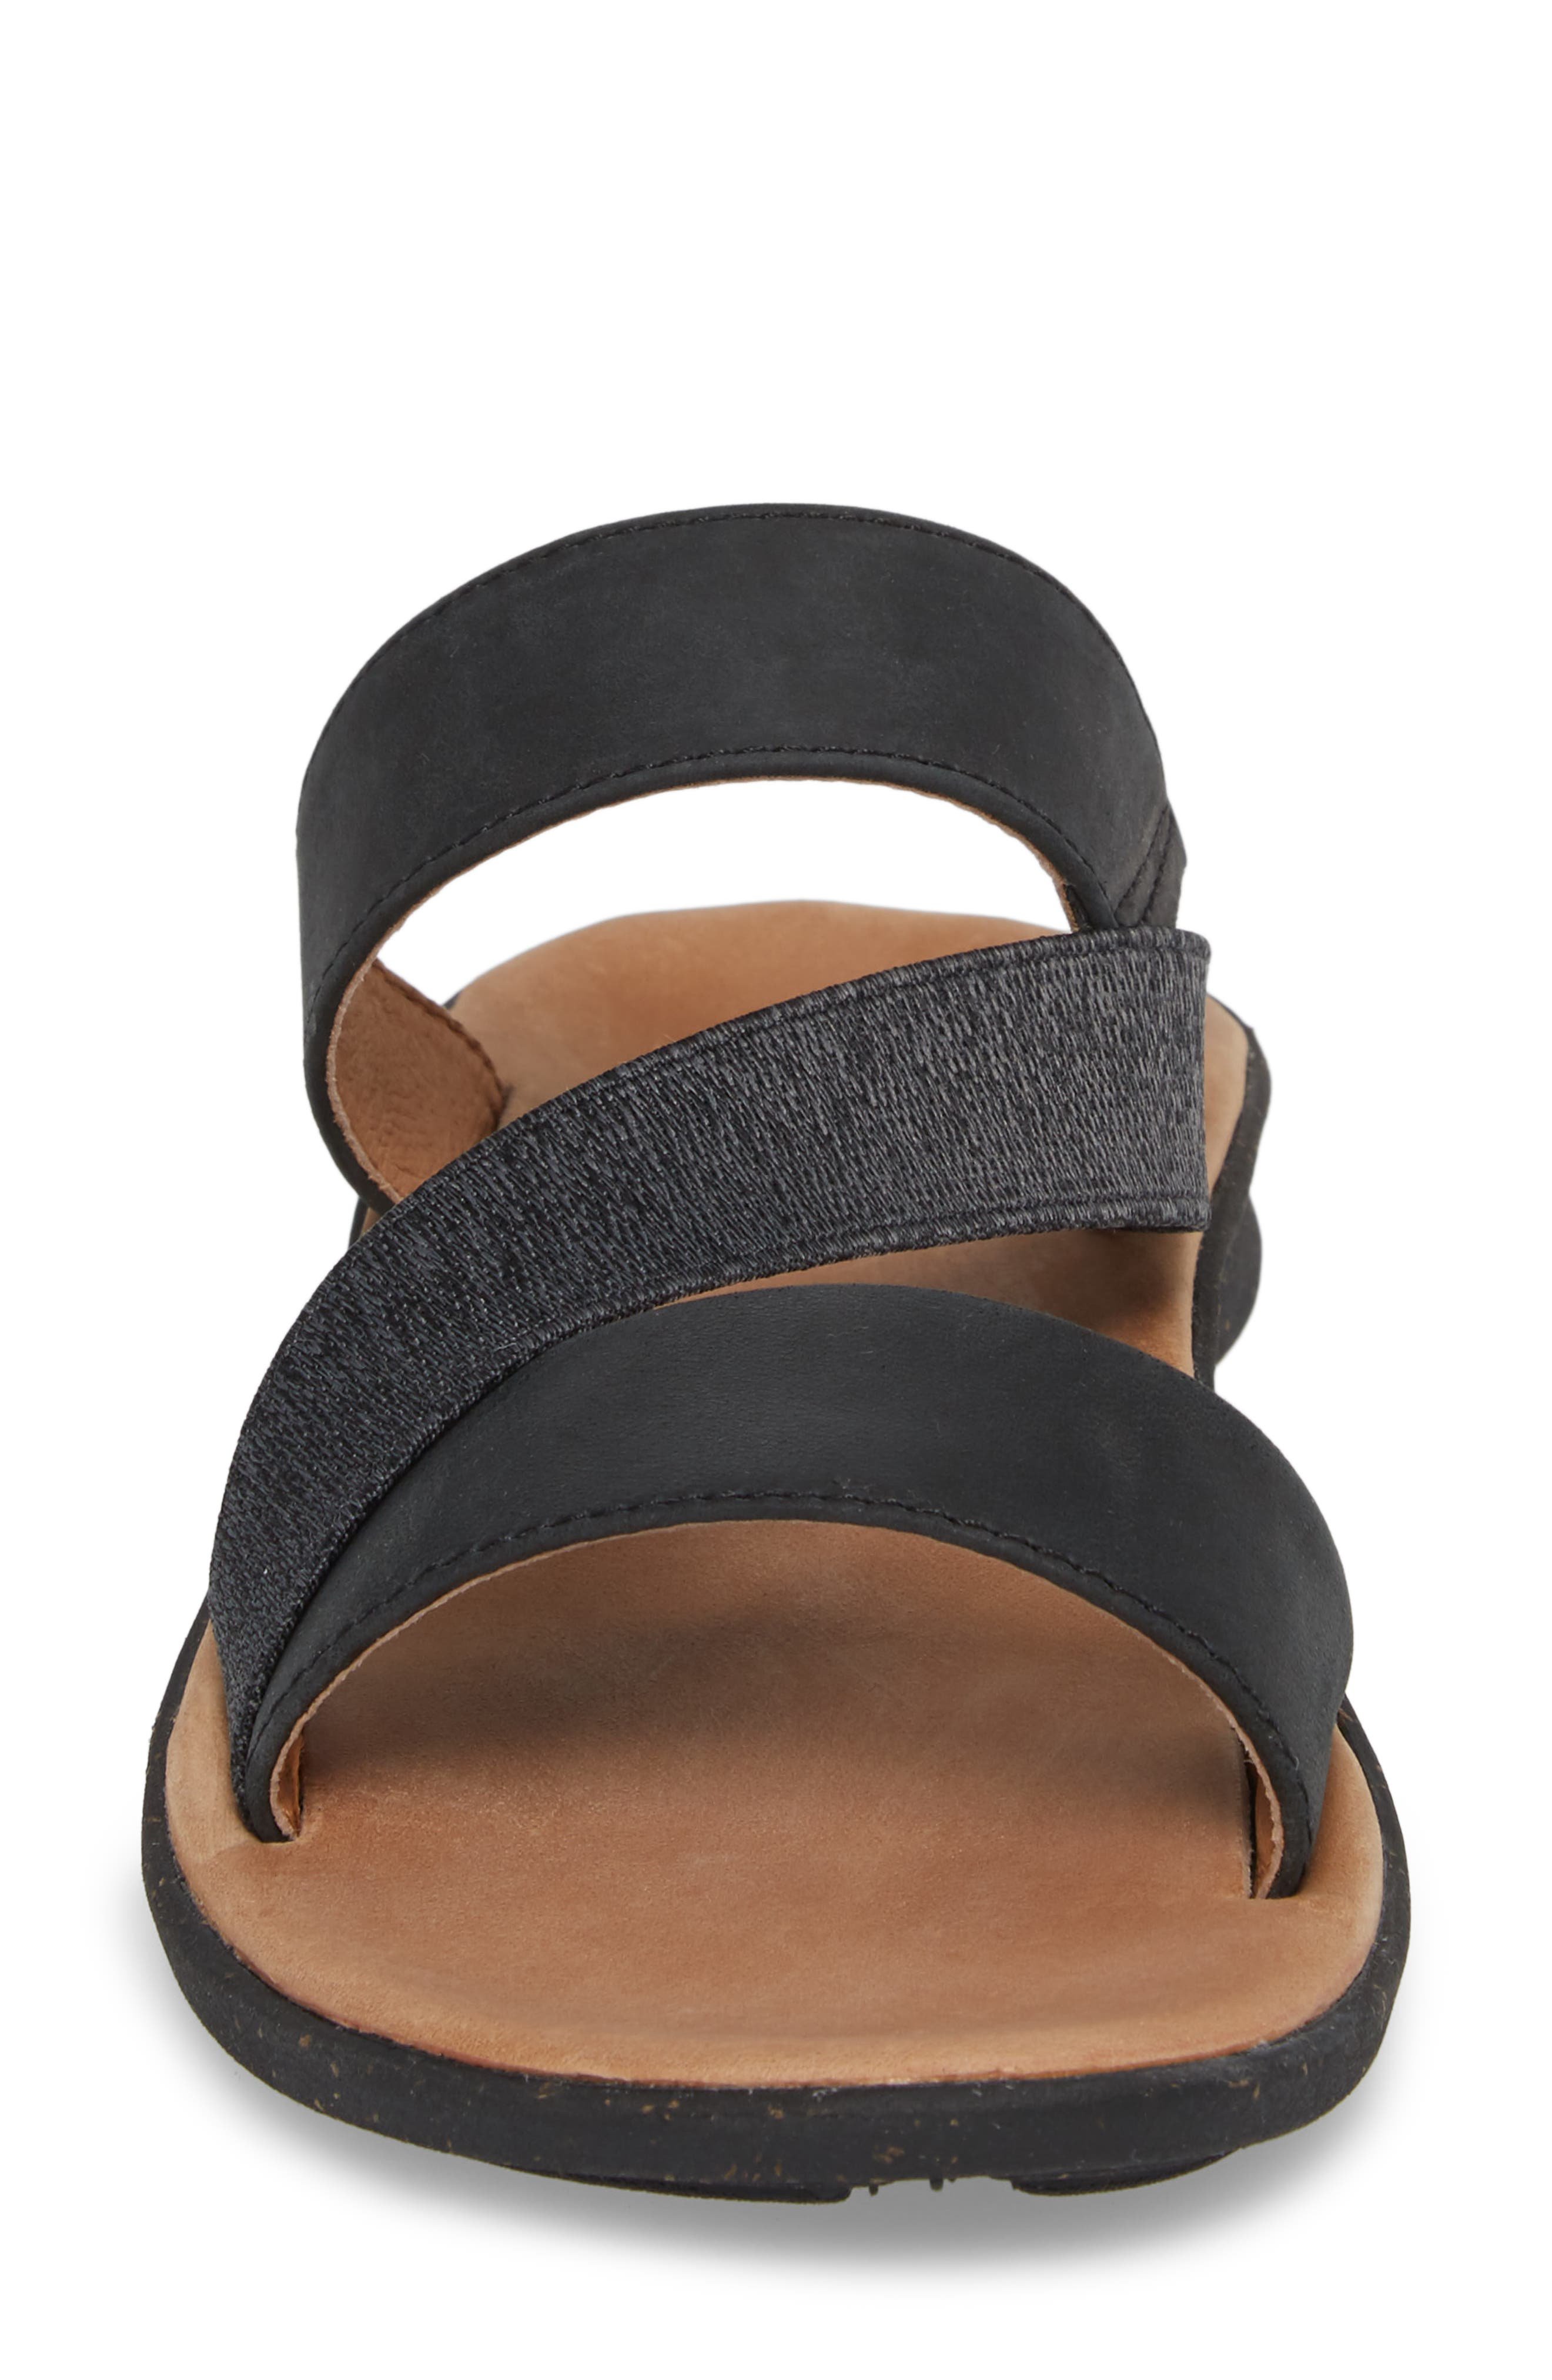 Reyes Slide Sandal,                             Alternate thumbnail 4, color,                             Black Leather